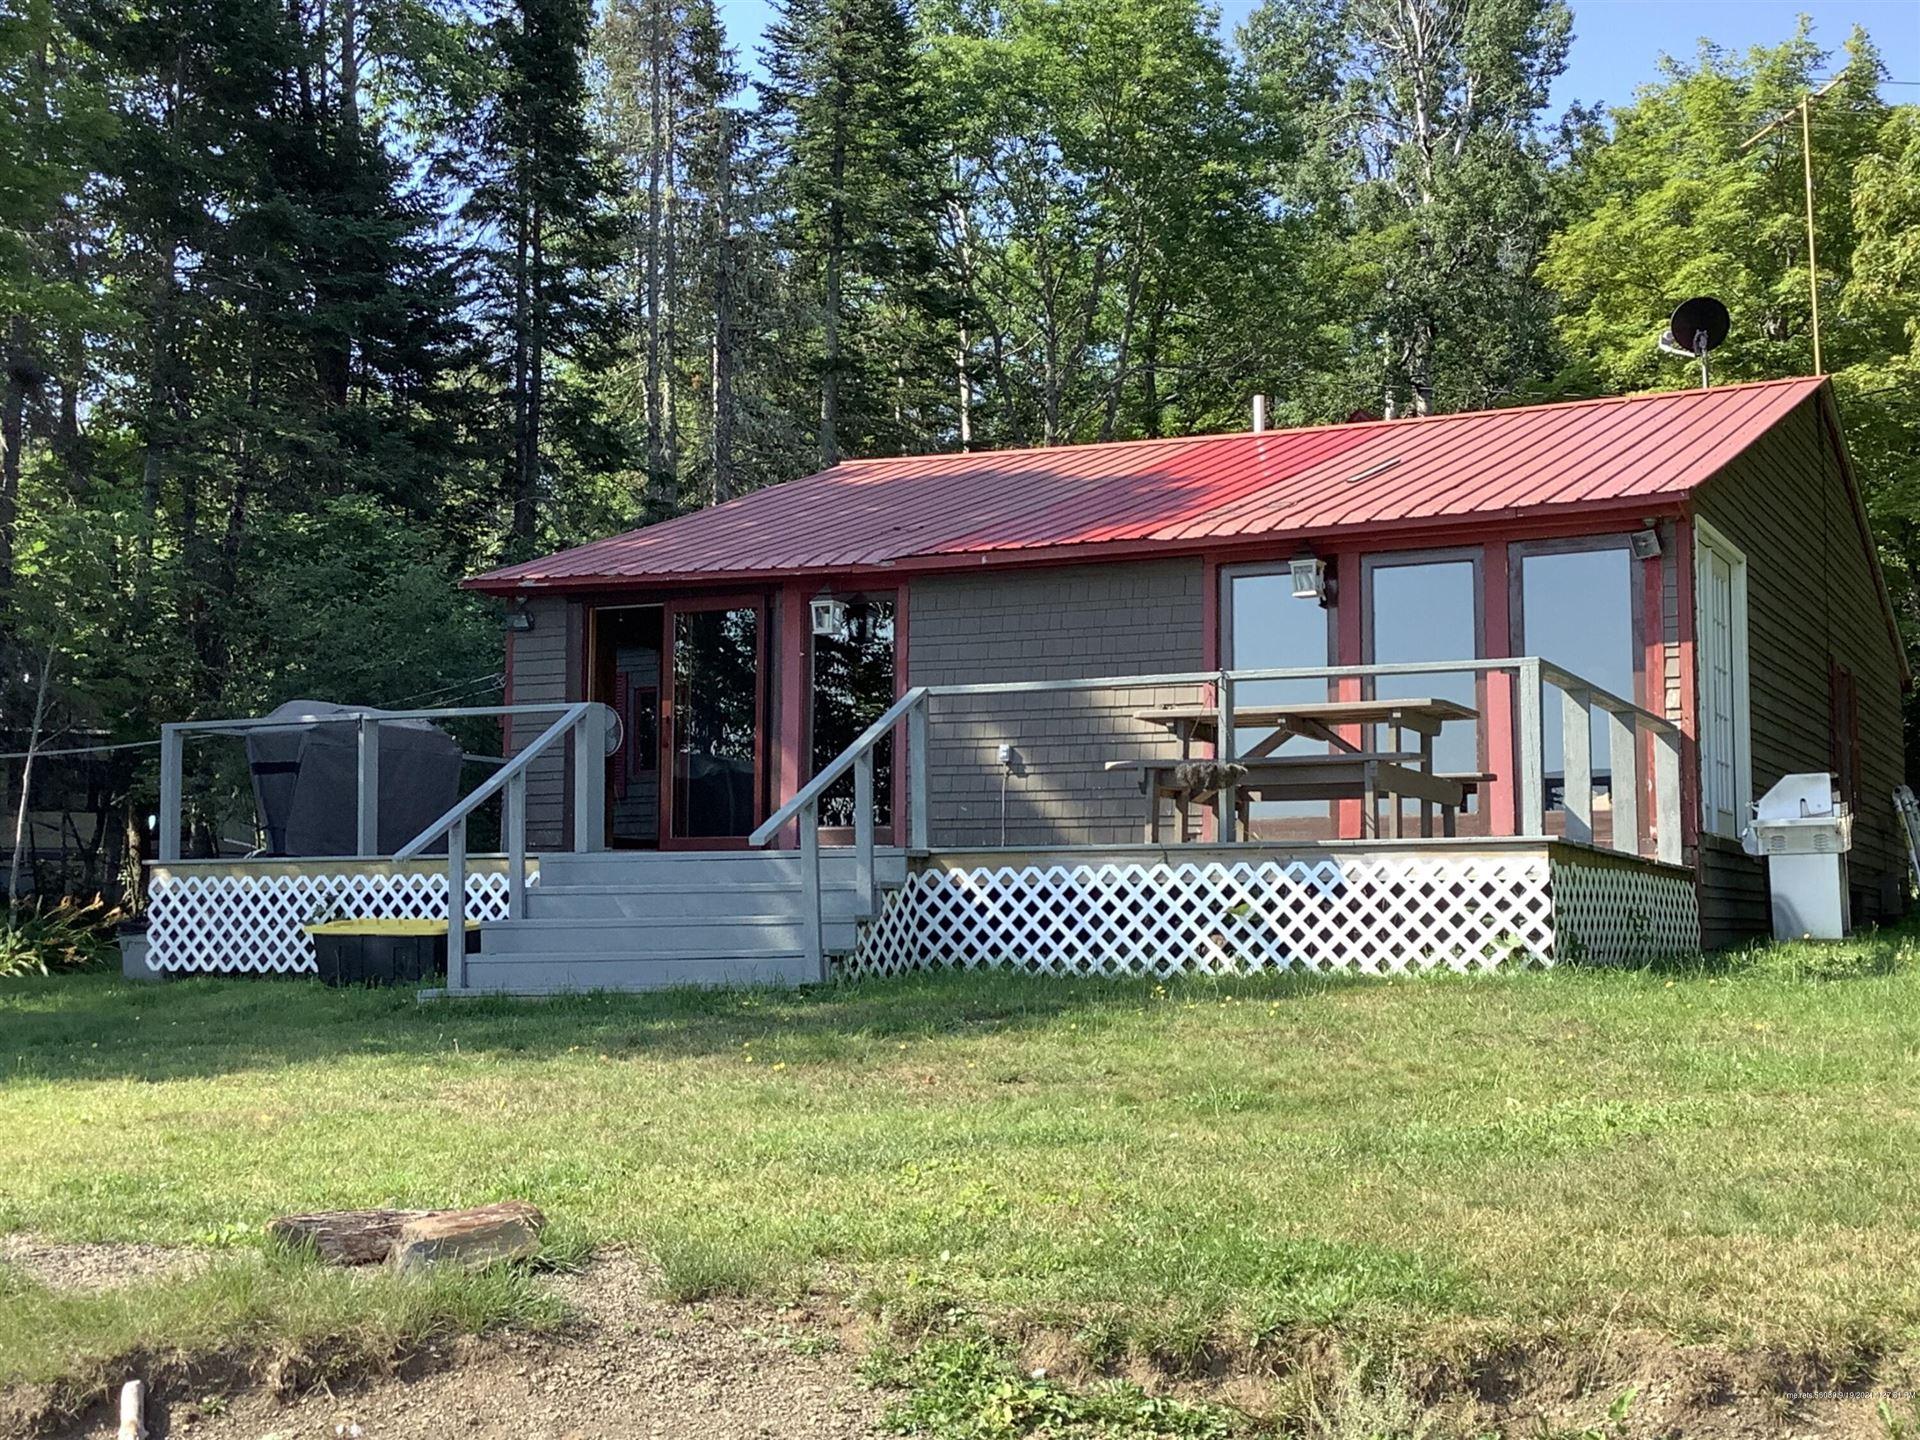 Photo of 384 W Road, Portage Lake, ME 04768 (MLS # 1509384)